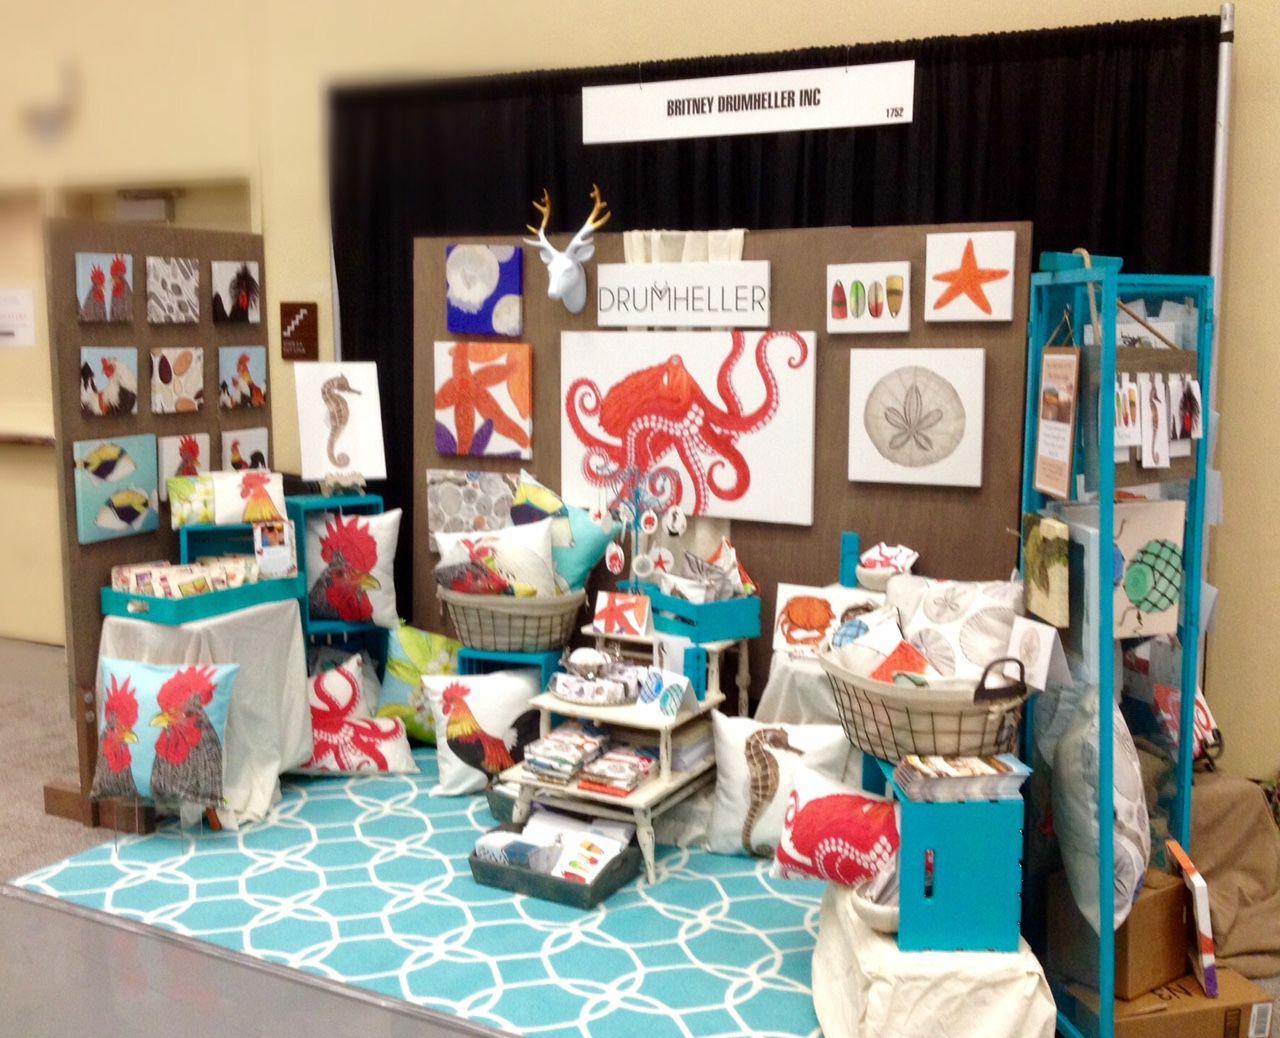 food style event abbiglihome abbigliinspiration abbiglievents fair abbigliexhibitions giftshow market